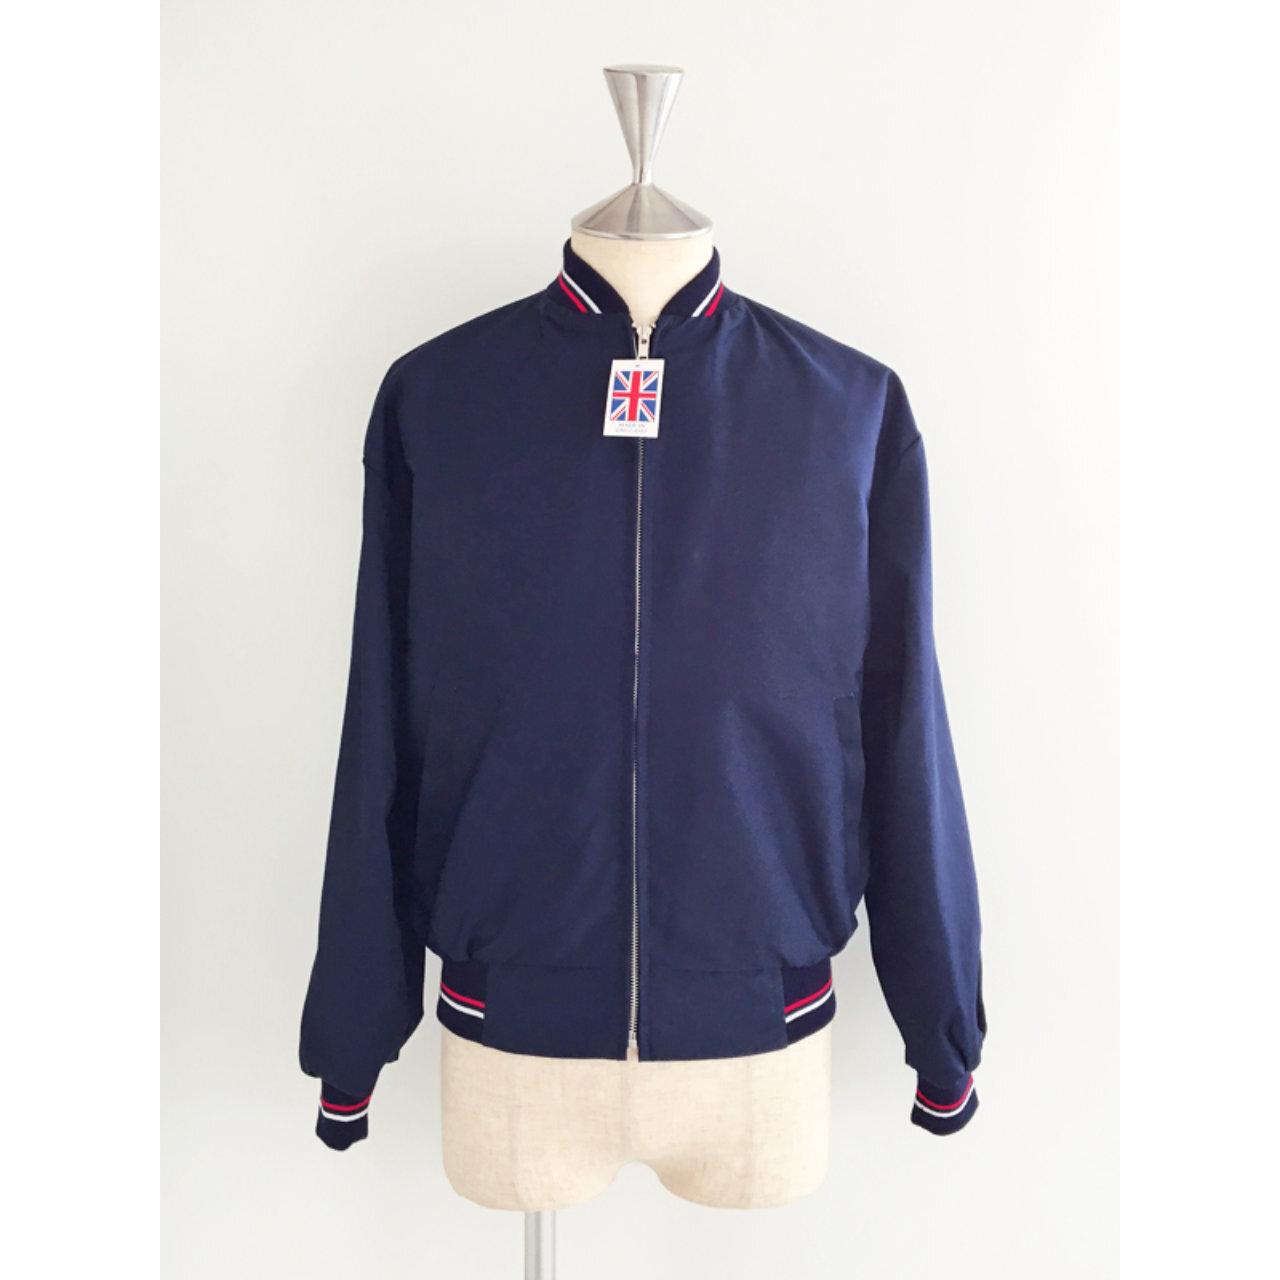 【RELCO LONDON】 英国製 モンキージャケット 〈Navy〉